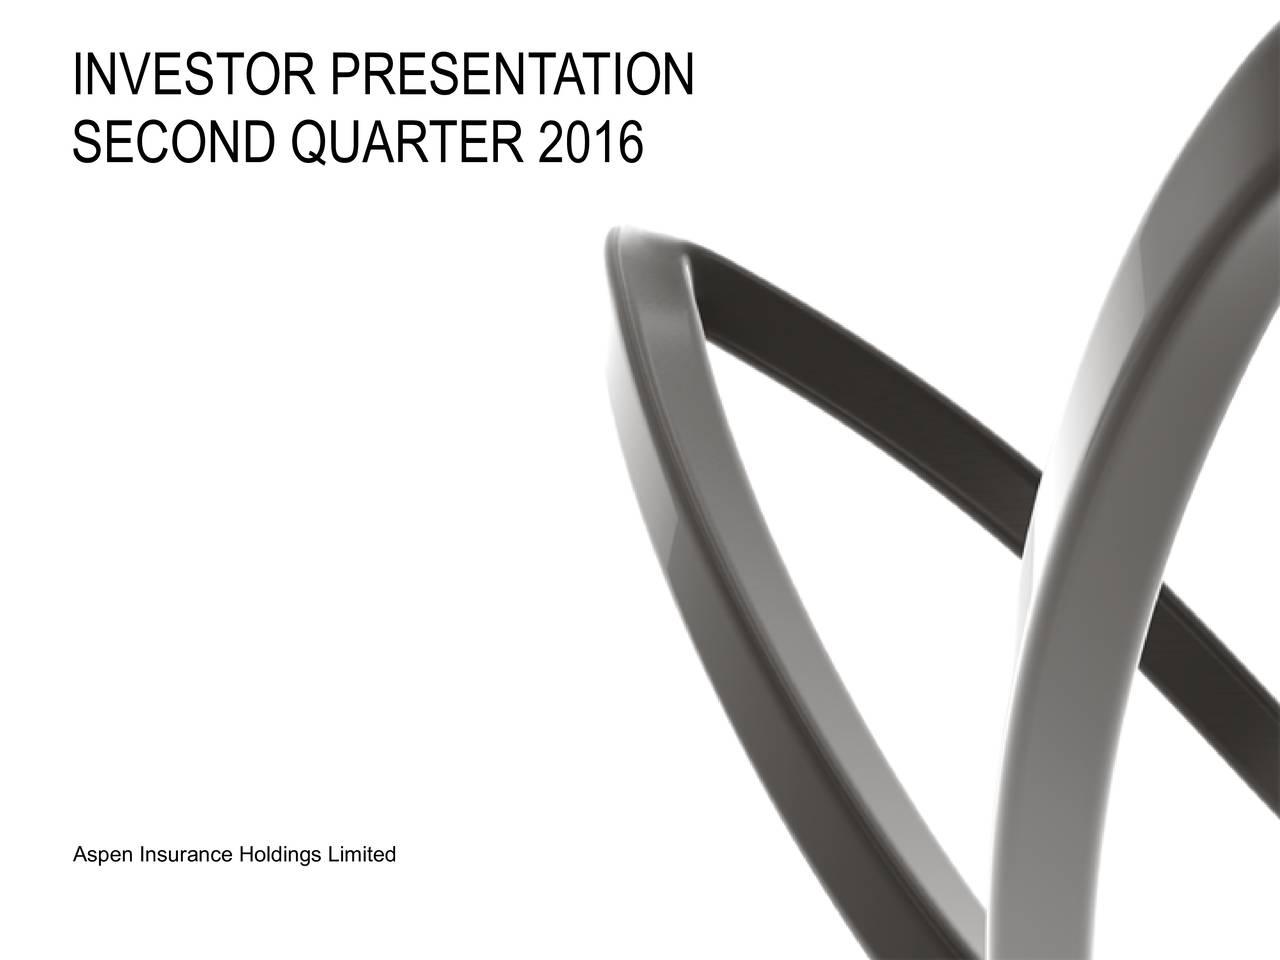 SECOND QUARTER 2016 Aspen Insurance Holdings Limited